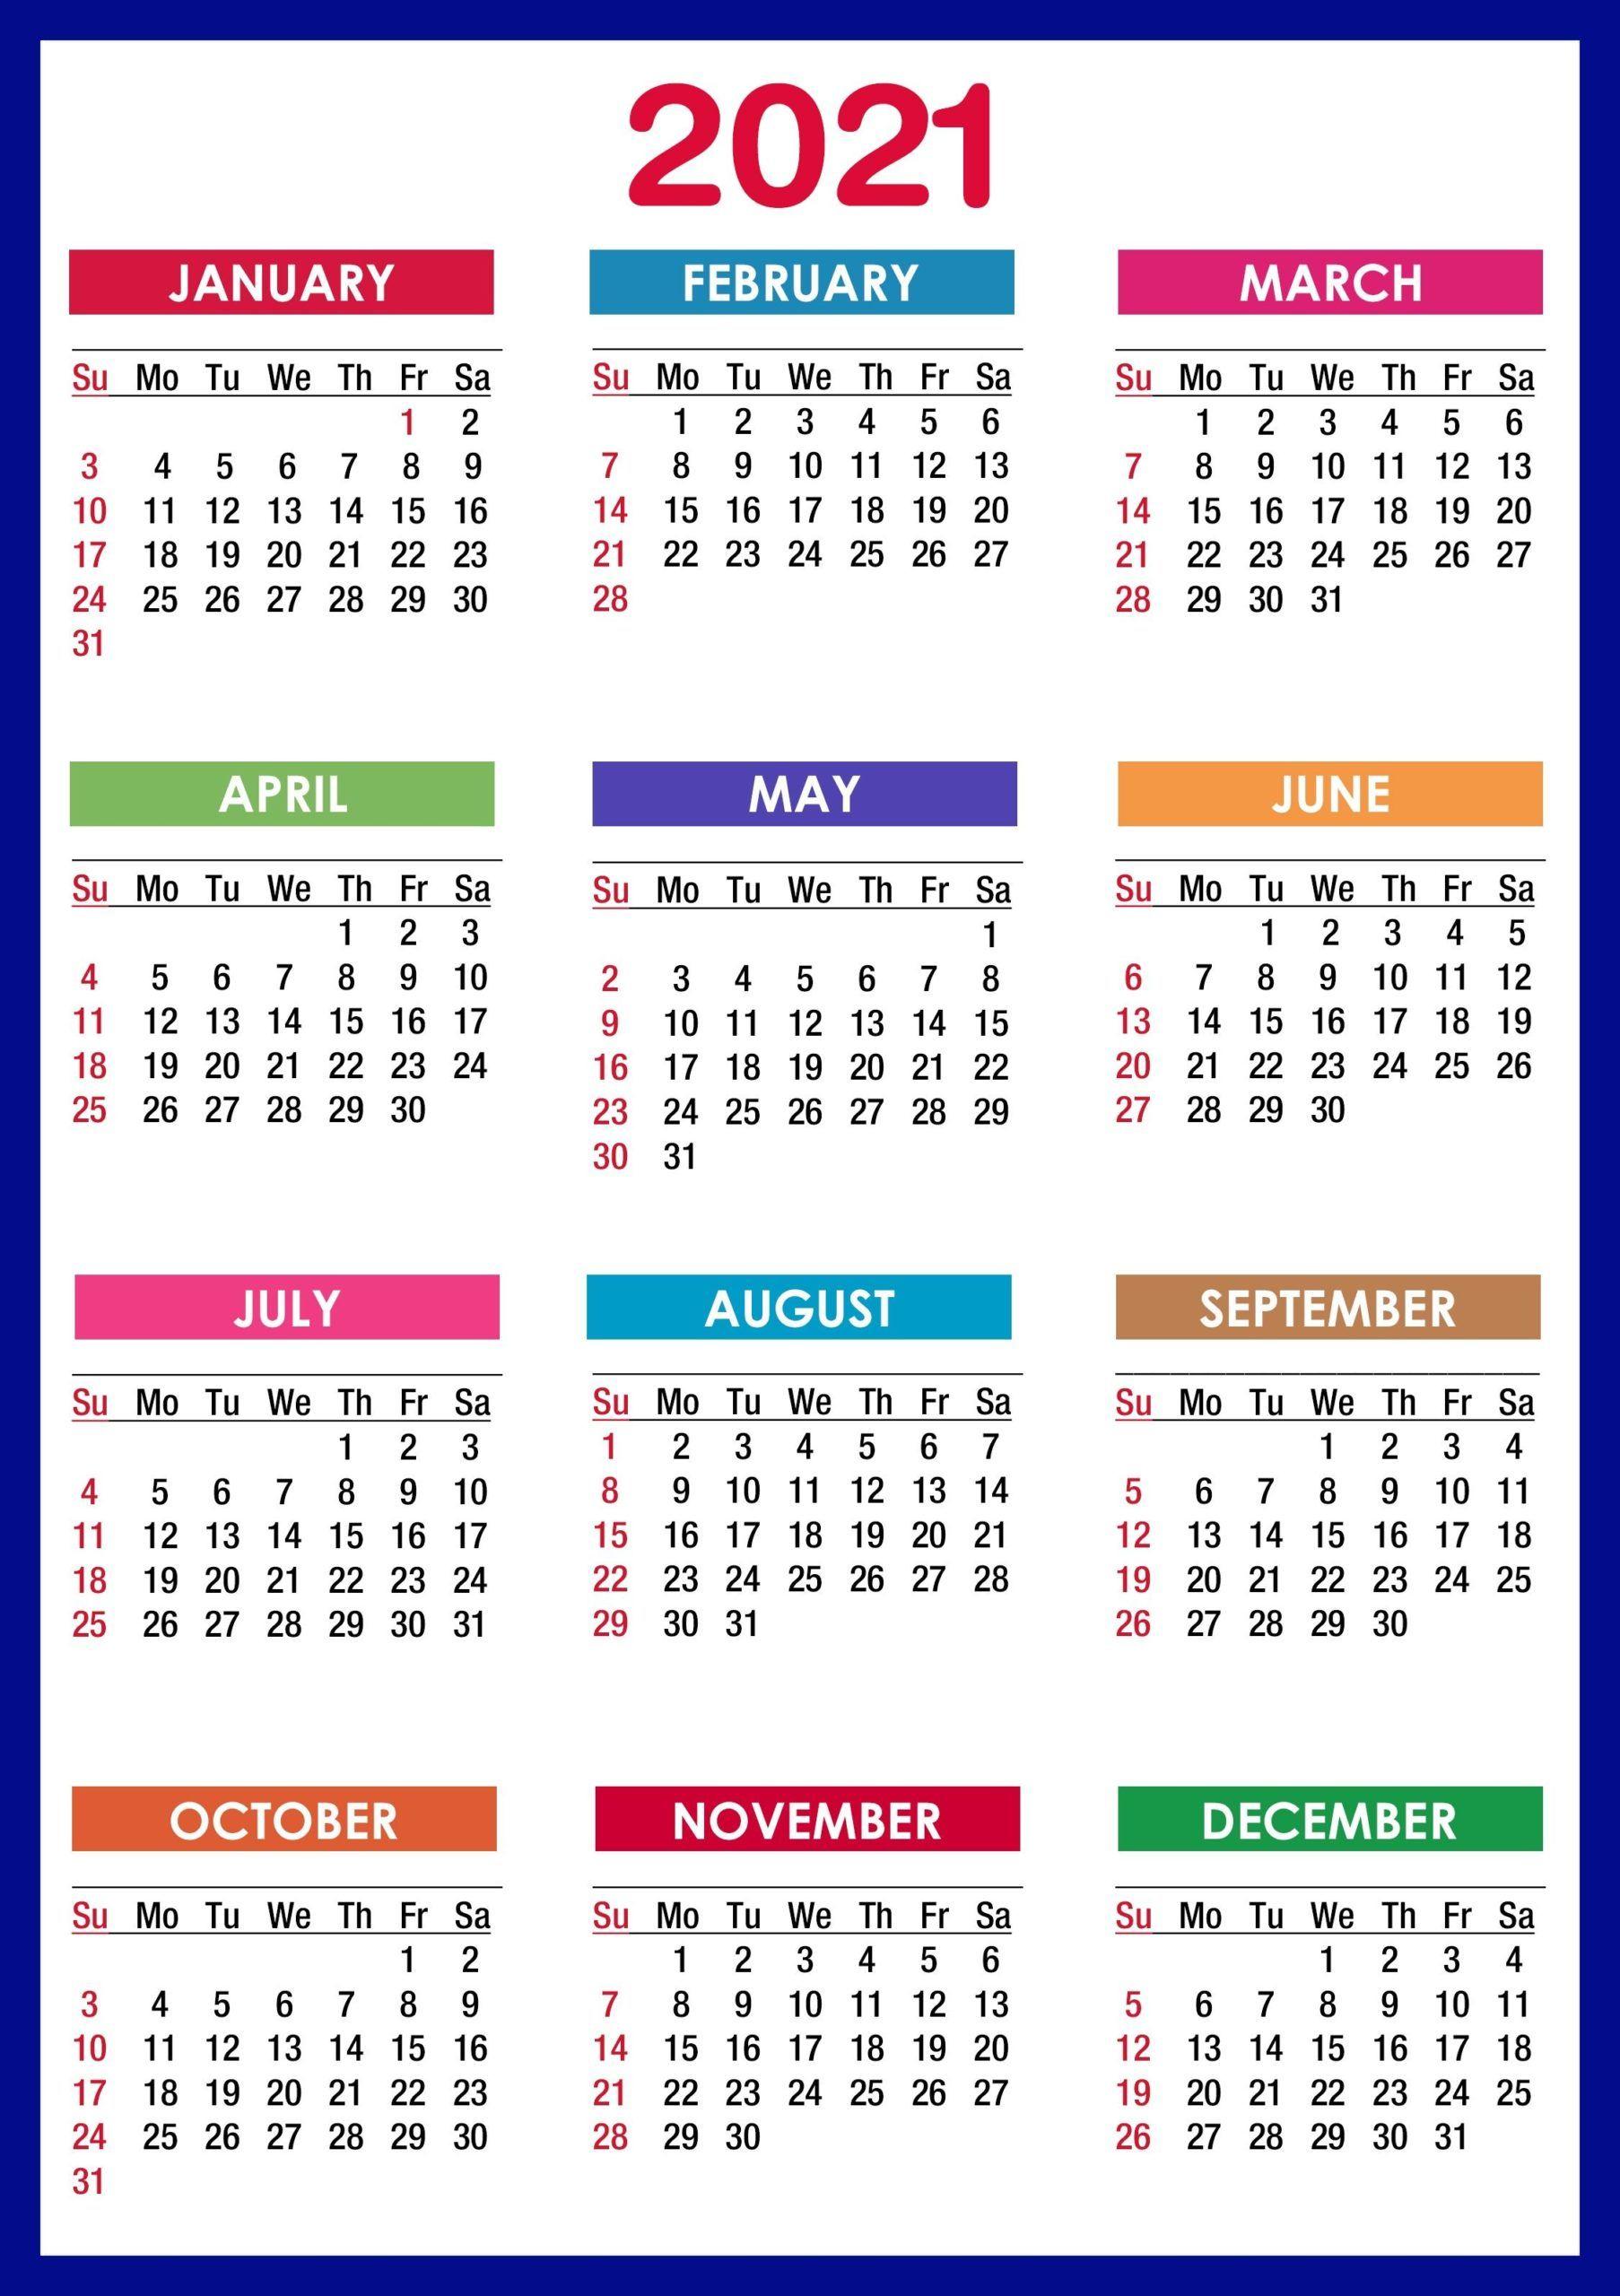 2021 Calendar Printable | 12 Months All In One | Calendar